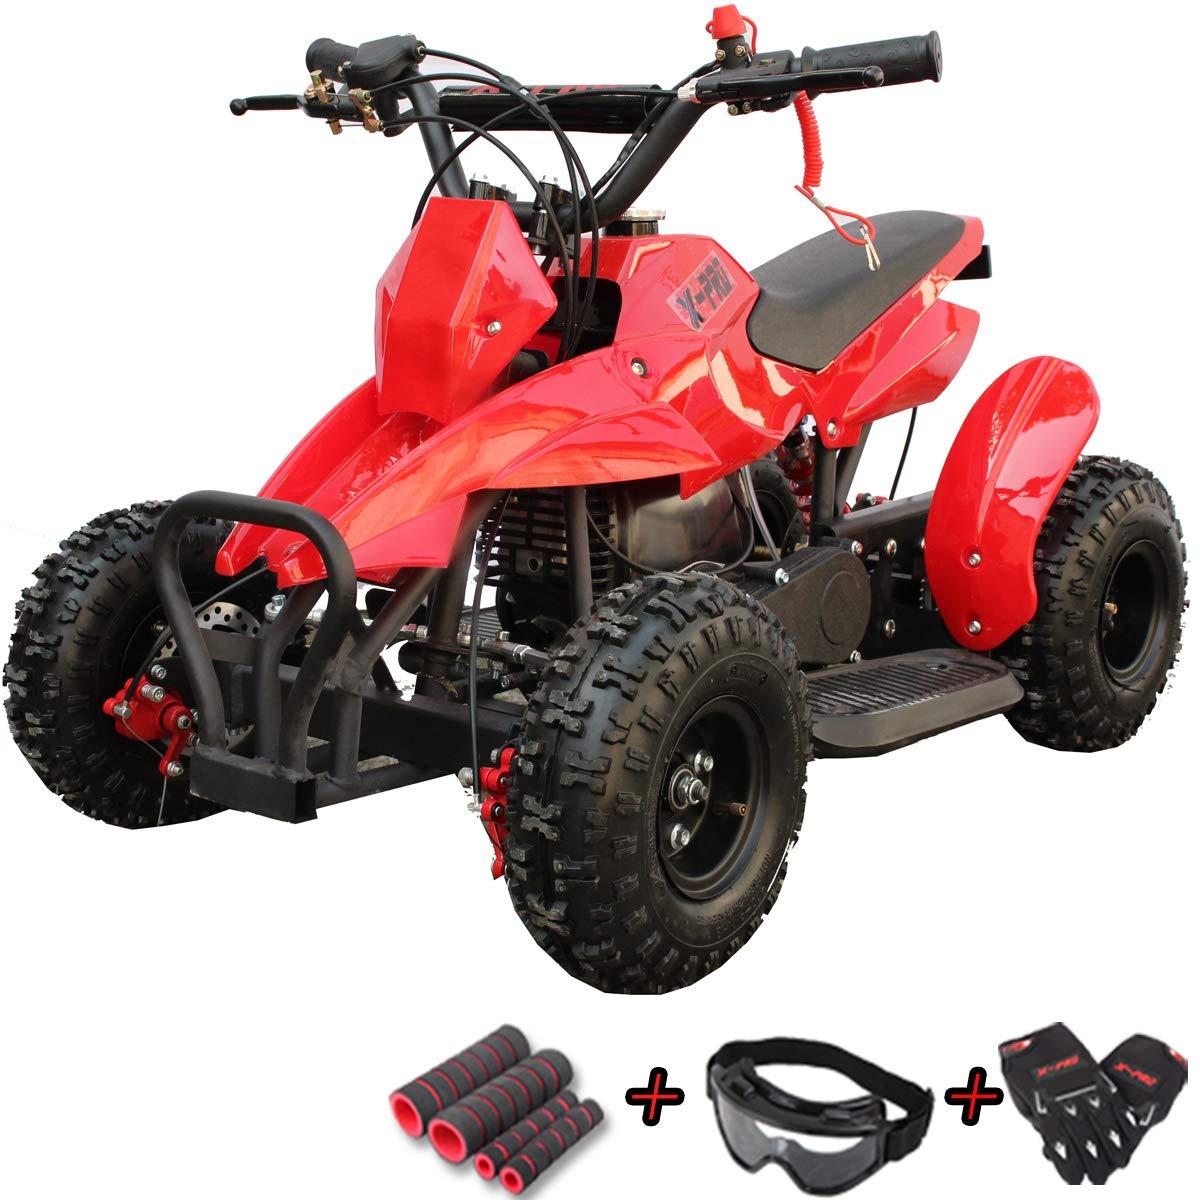 Goggle and Handgrip X-Pro 40cc Kids ATV 4 Wheelers 40cc ATV Quads Kids Quad with Gloves